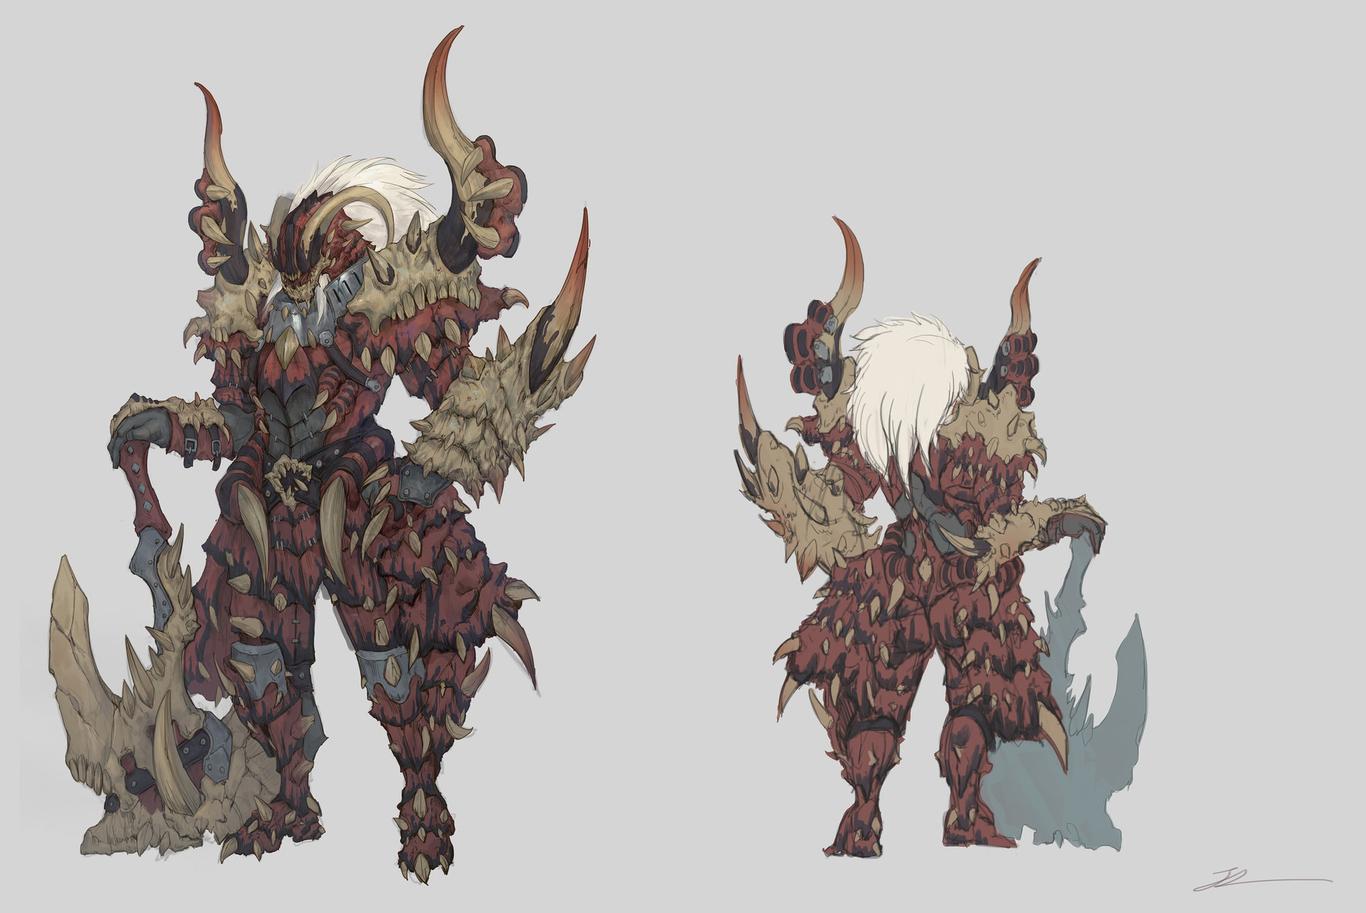 Junlingwang the dragon warrior 1 ede53e18 0mkw